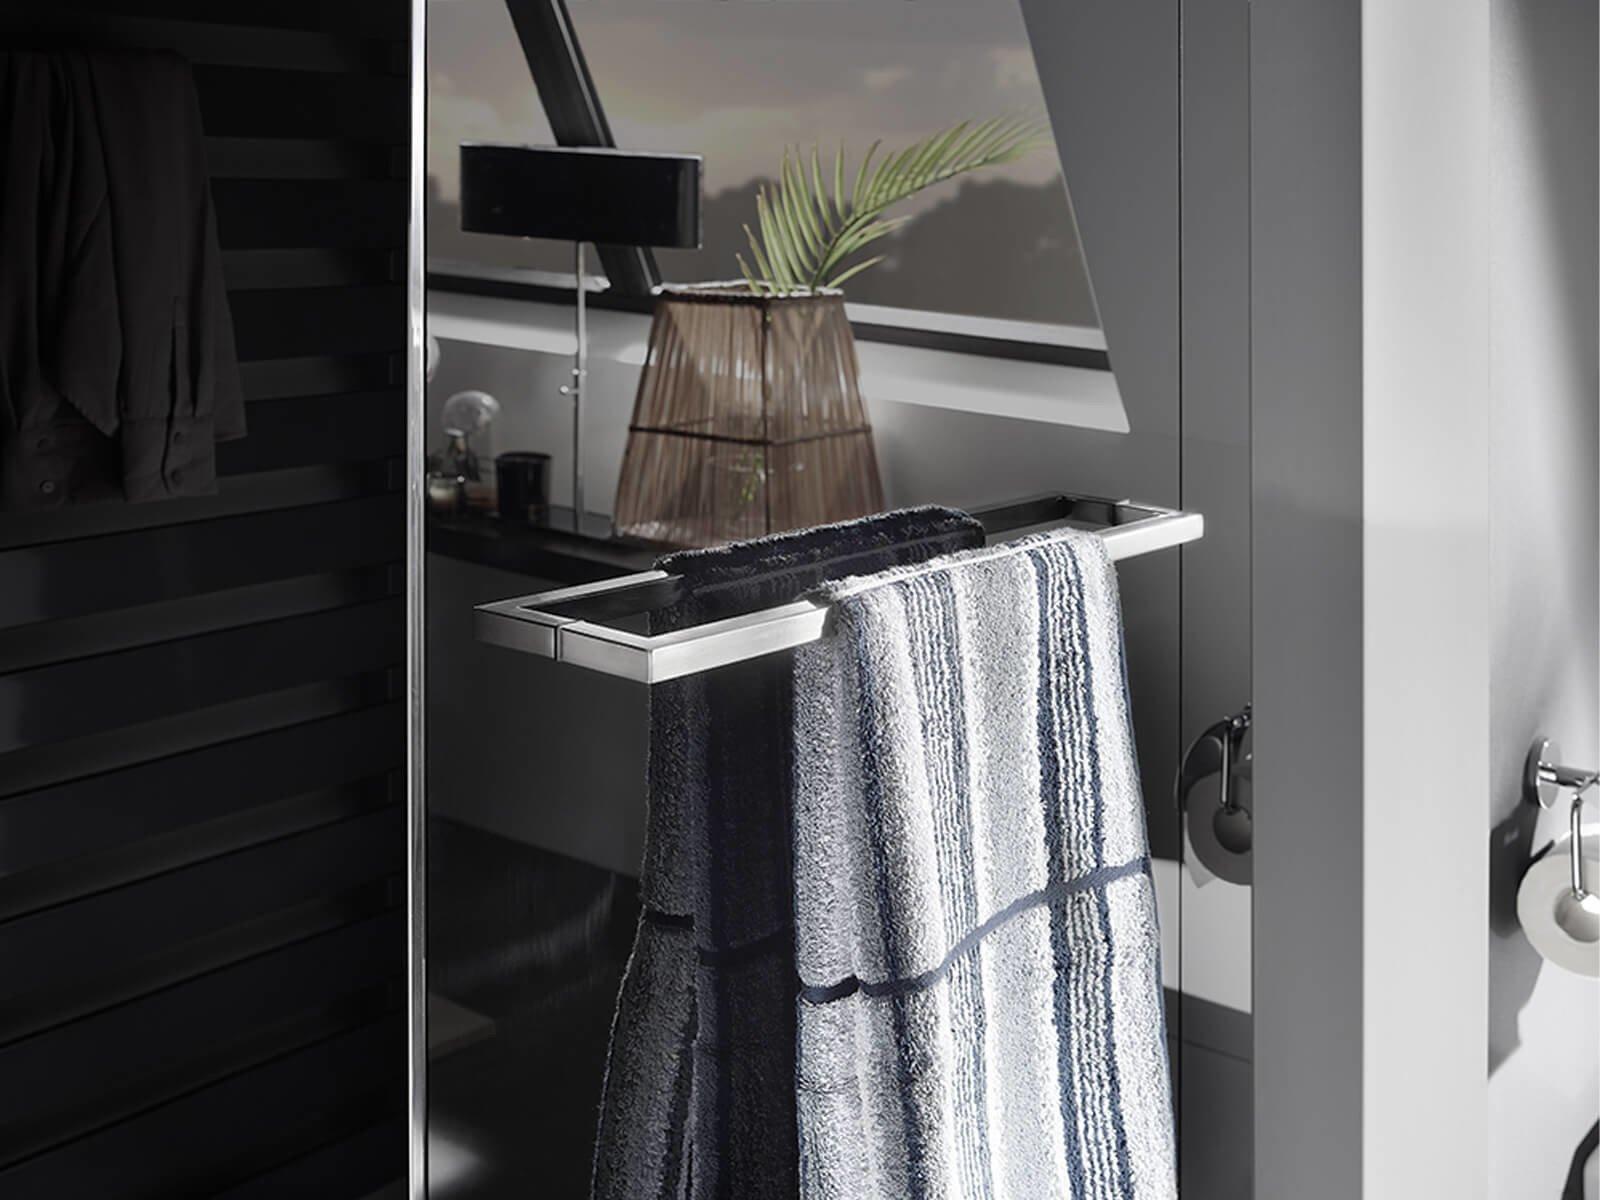 eckiger-handtuchhalter-aus-mattem-edelstahl-mit-handtuch-an-dunkelgrauer-duschwand